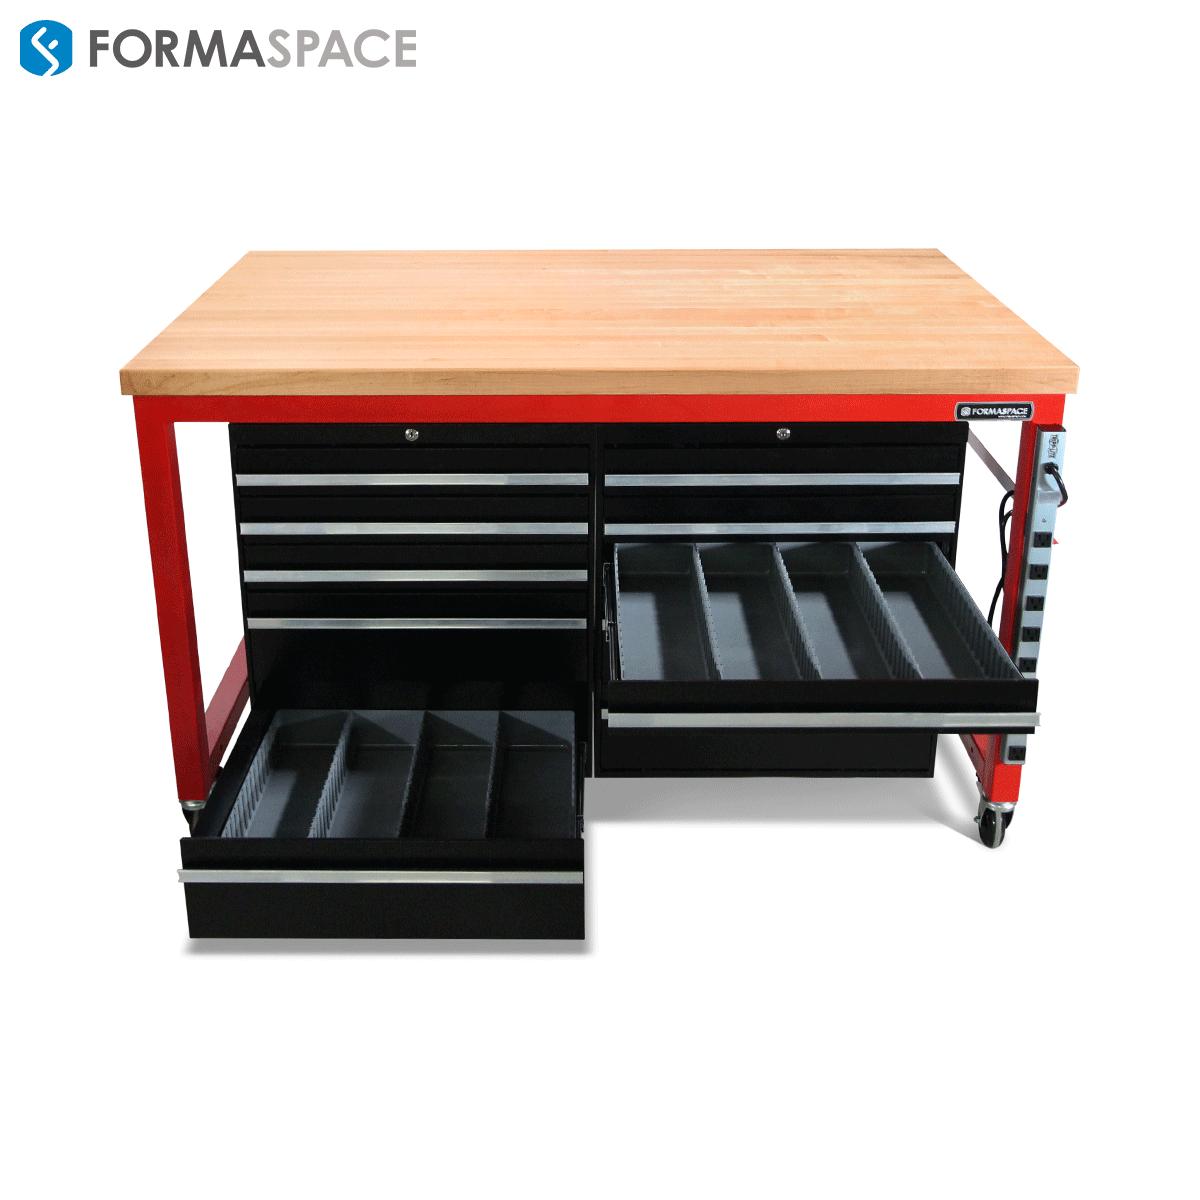 tool storage system with locking drawers